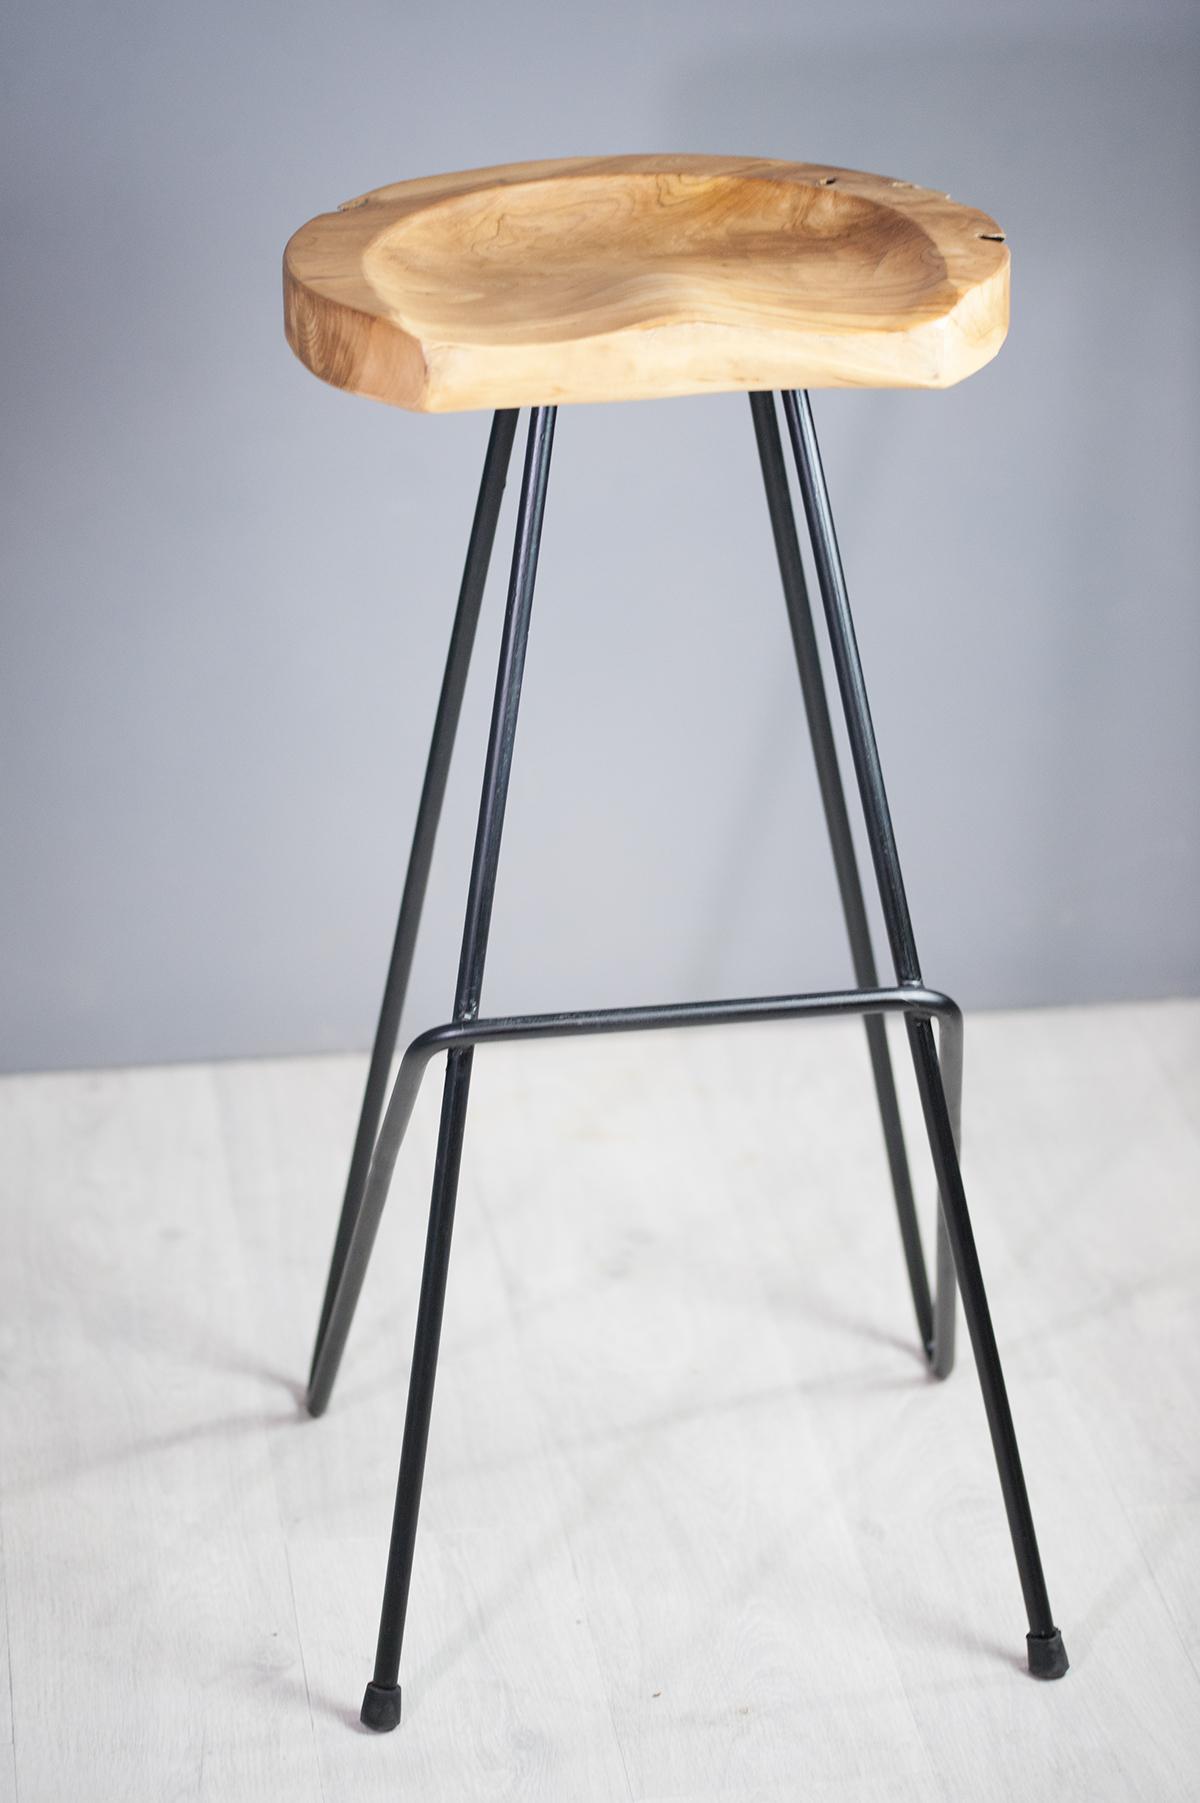 Tabouret design tabouret de bar en racine de teck et m tal for Tabouret a bar